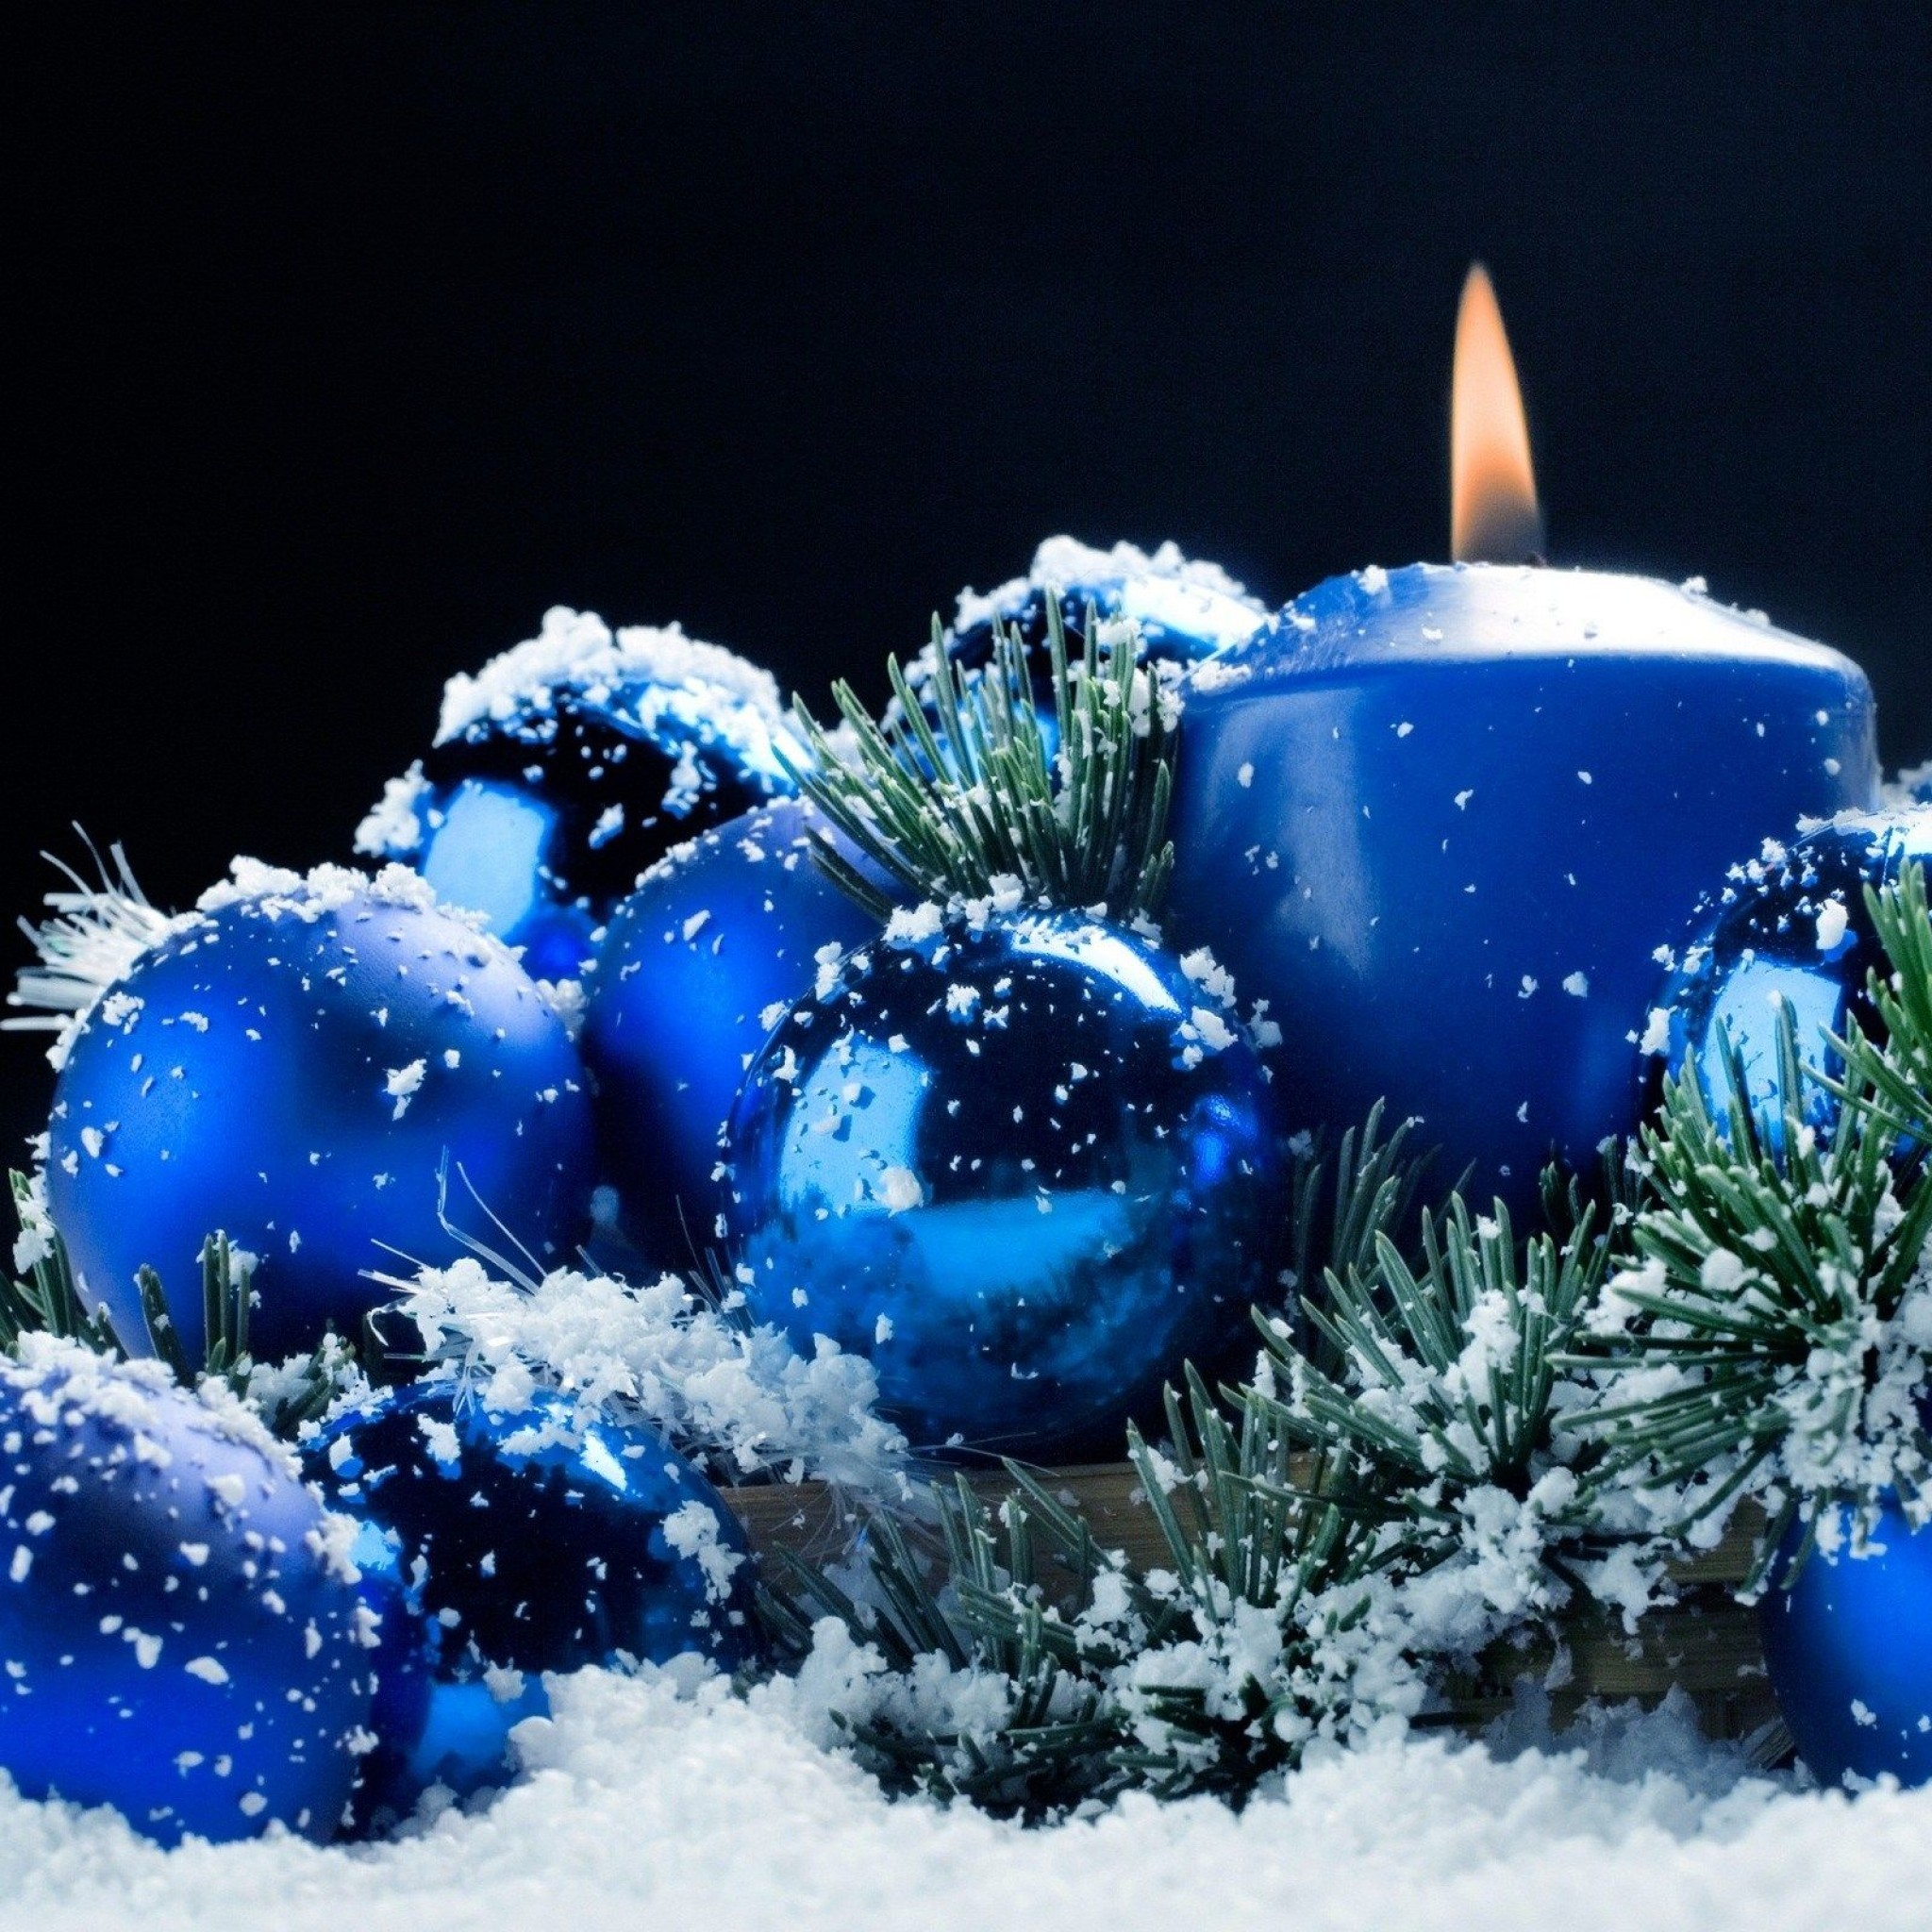 Snow Live Wallpaper: Live Christmas Wallpaper For IPad